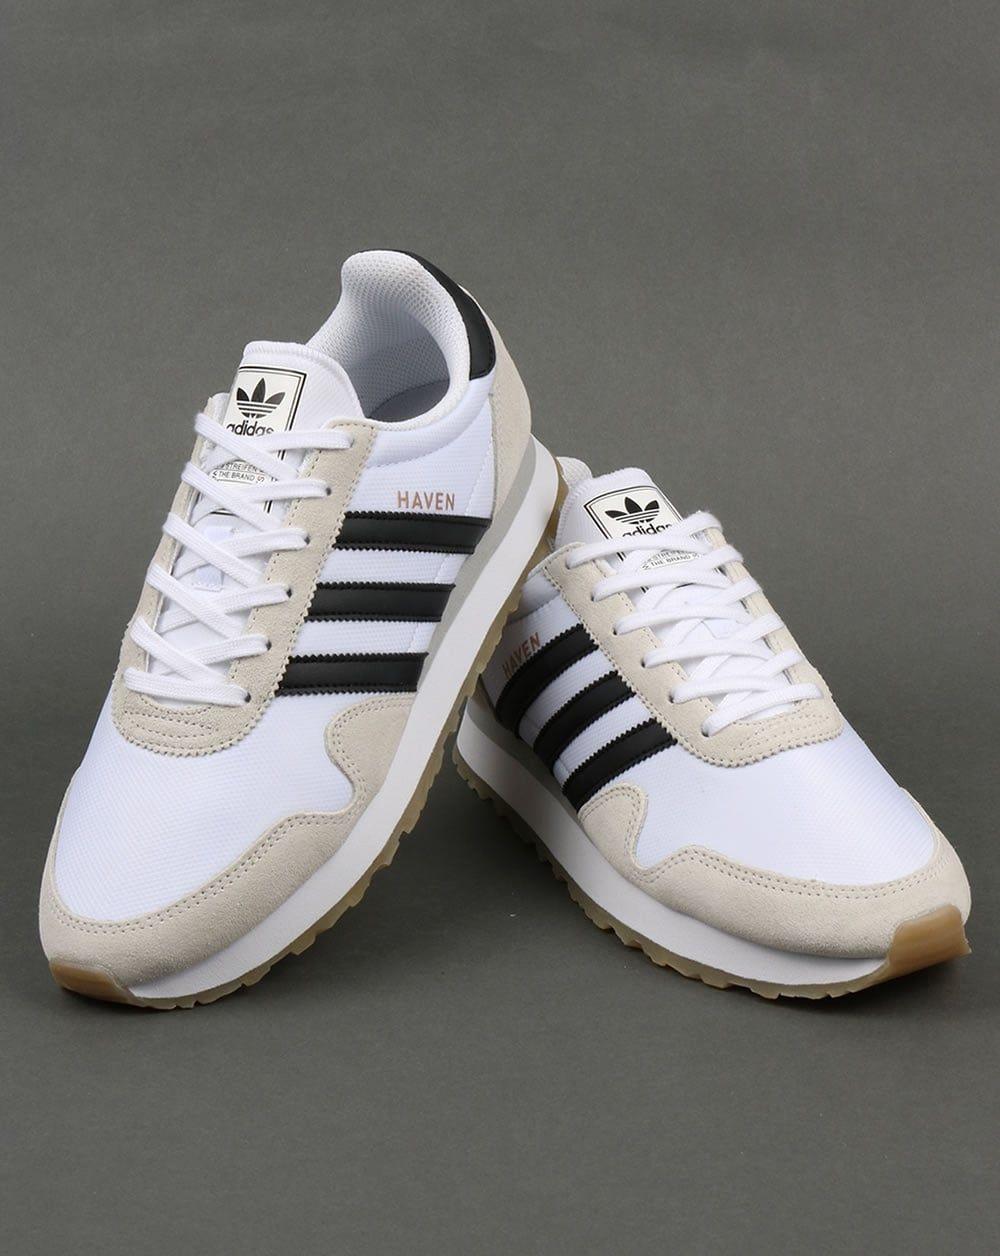 adidas haven trainers gum shoes mens